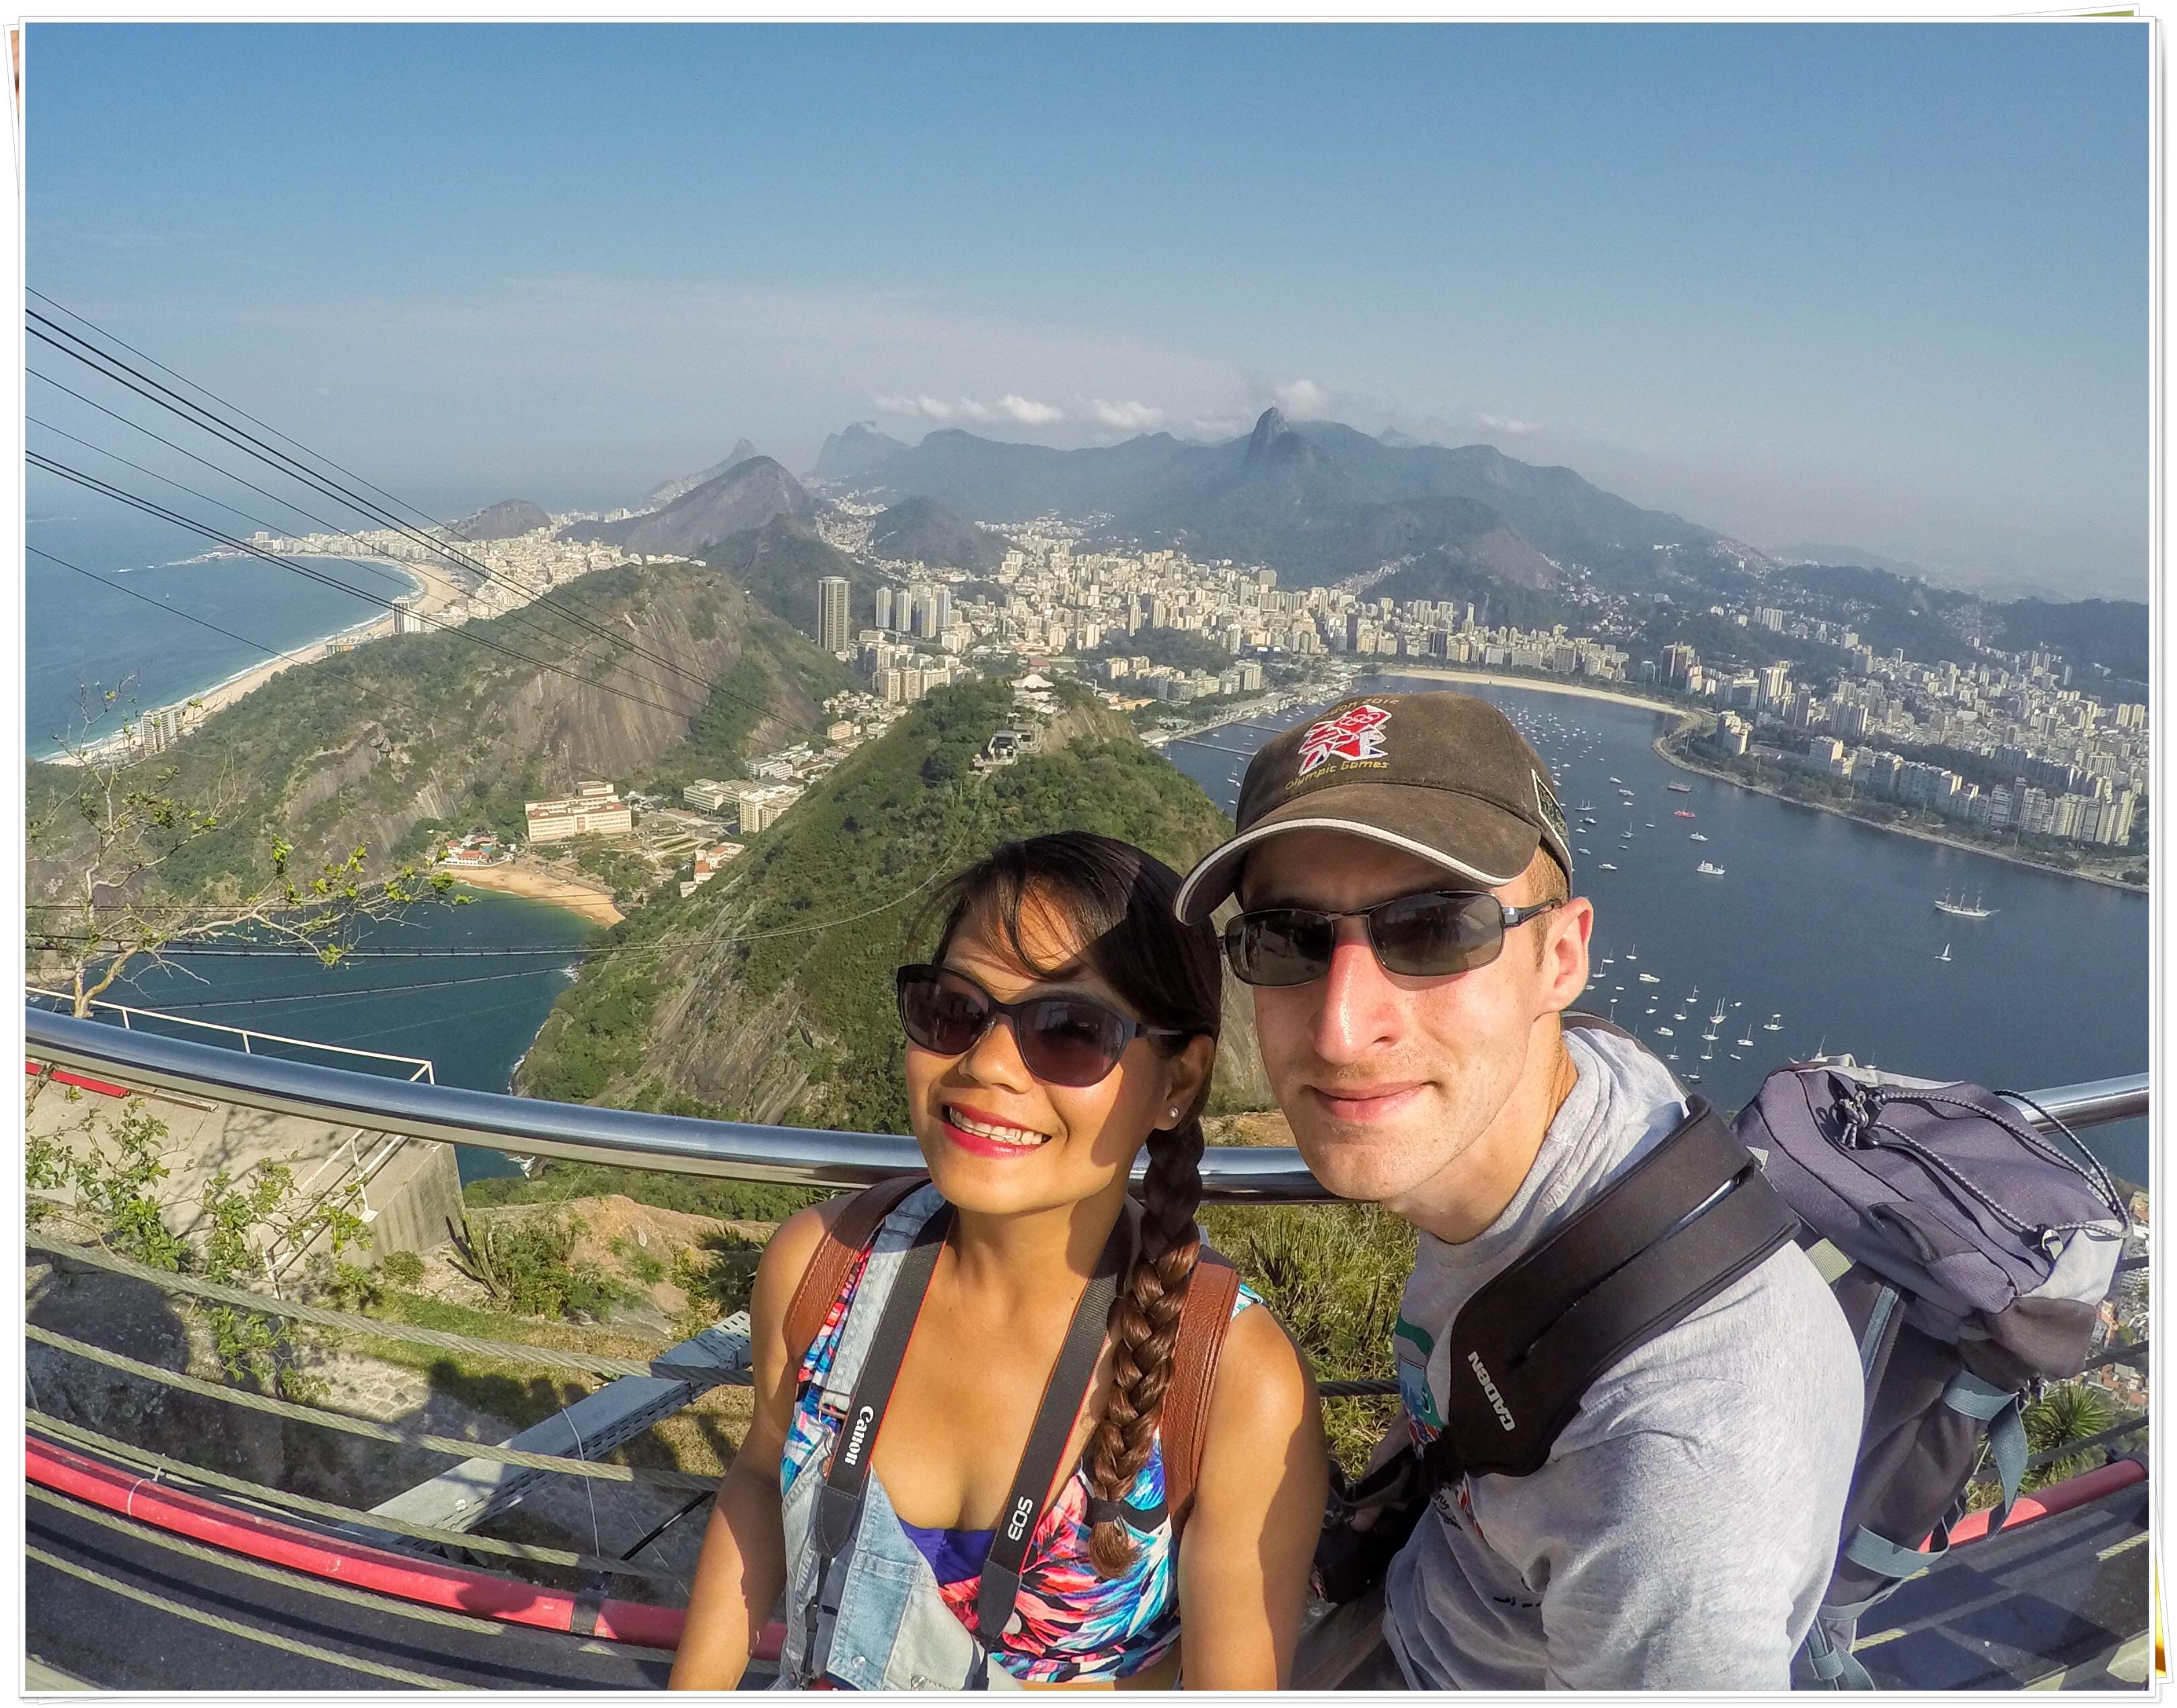 2016 Rio de Janeiro (On top of Sugarloaf Mountain)